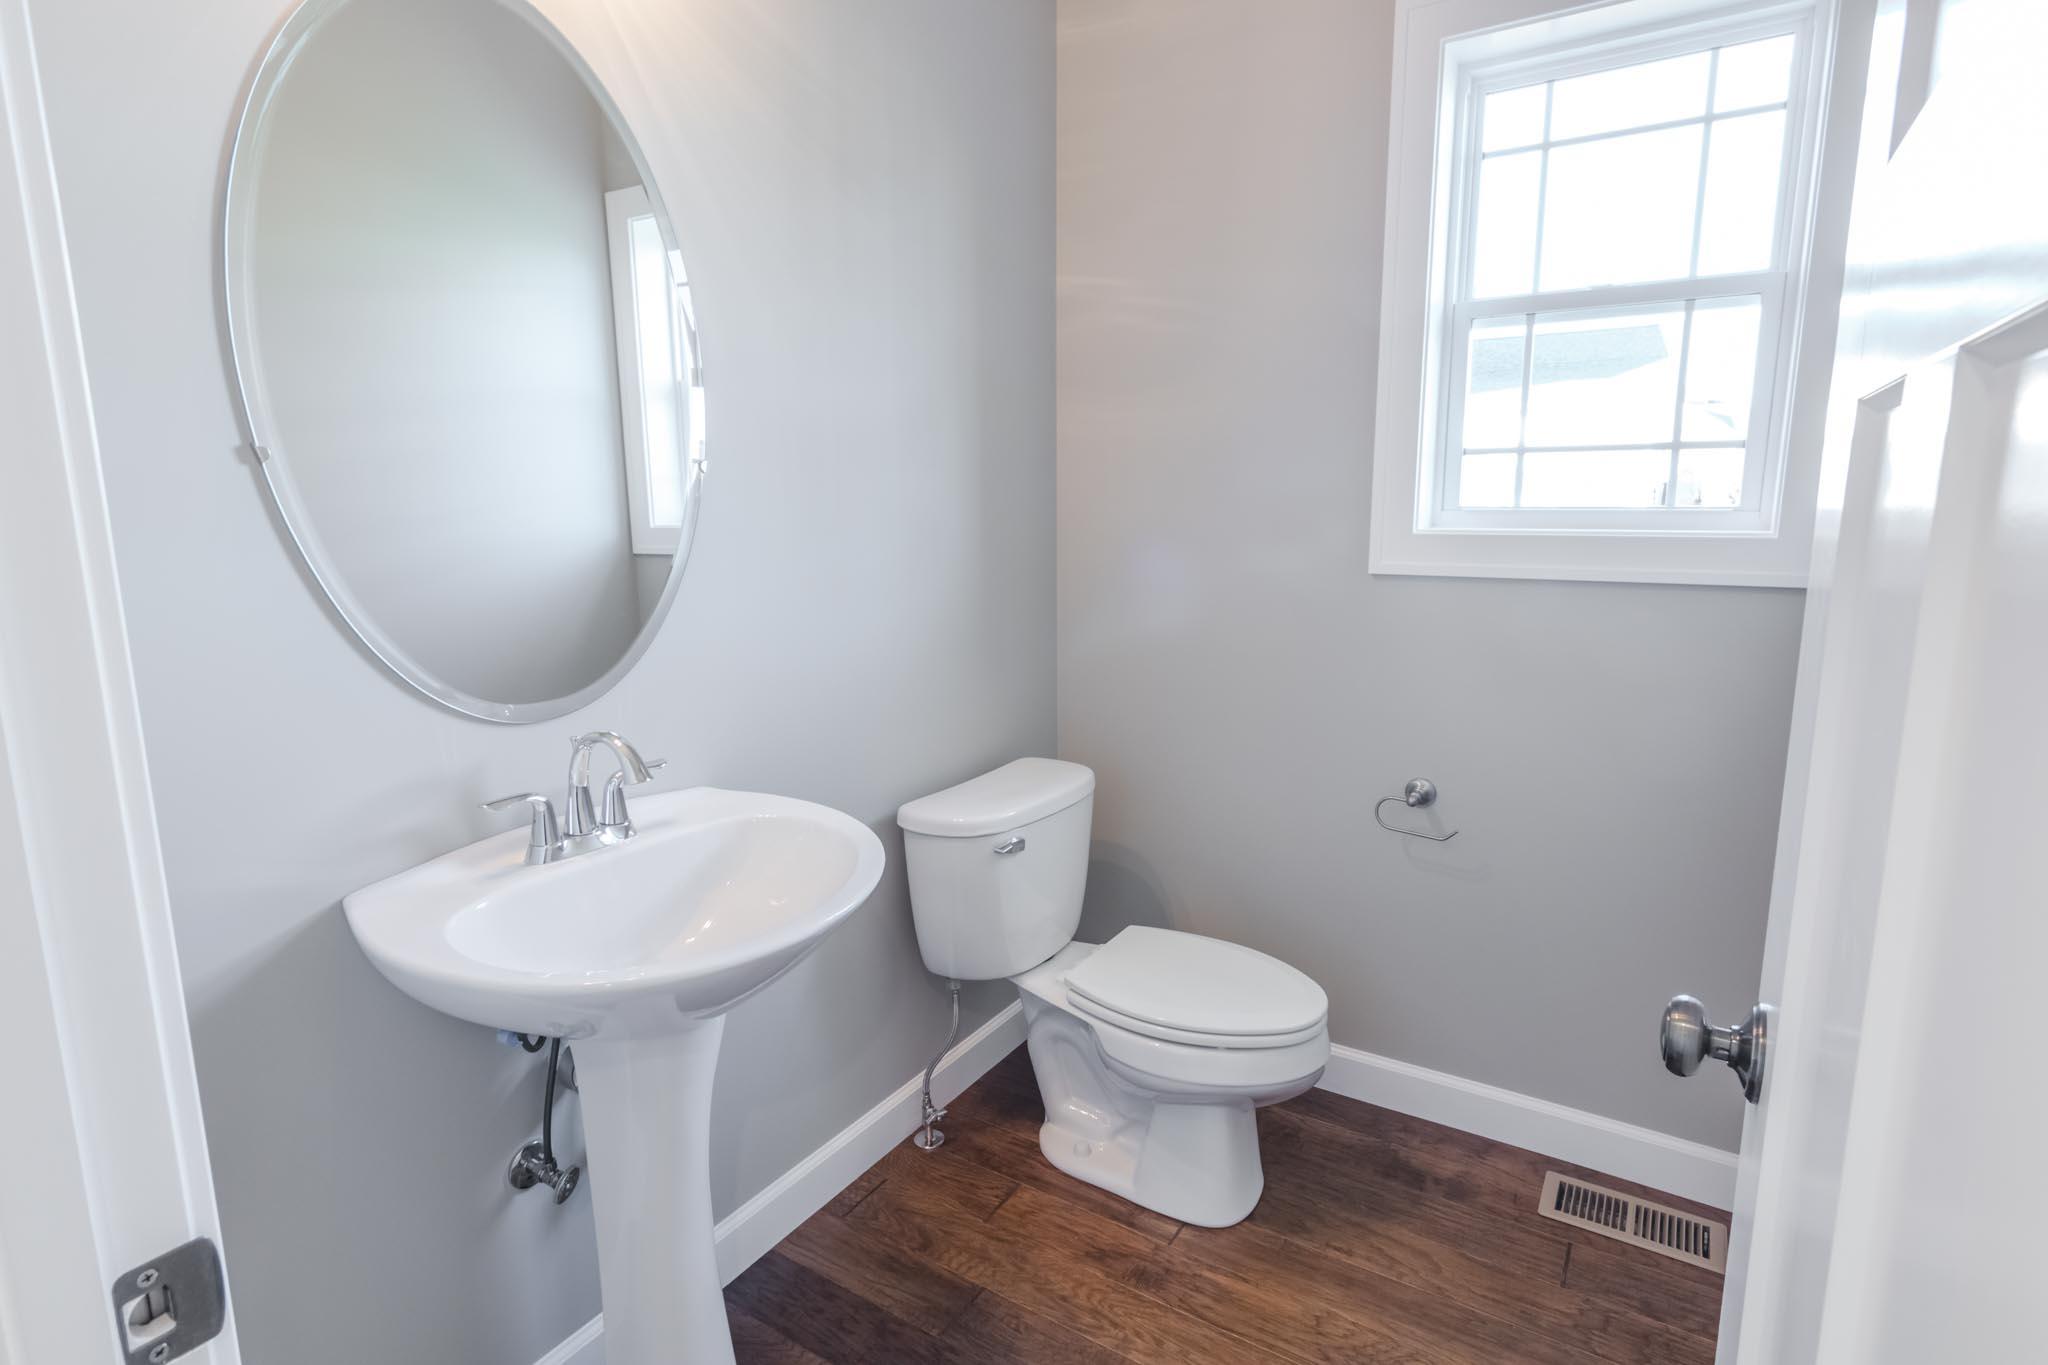 1815 Pfitzer bathroom in Normal IL home for sale